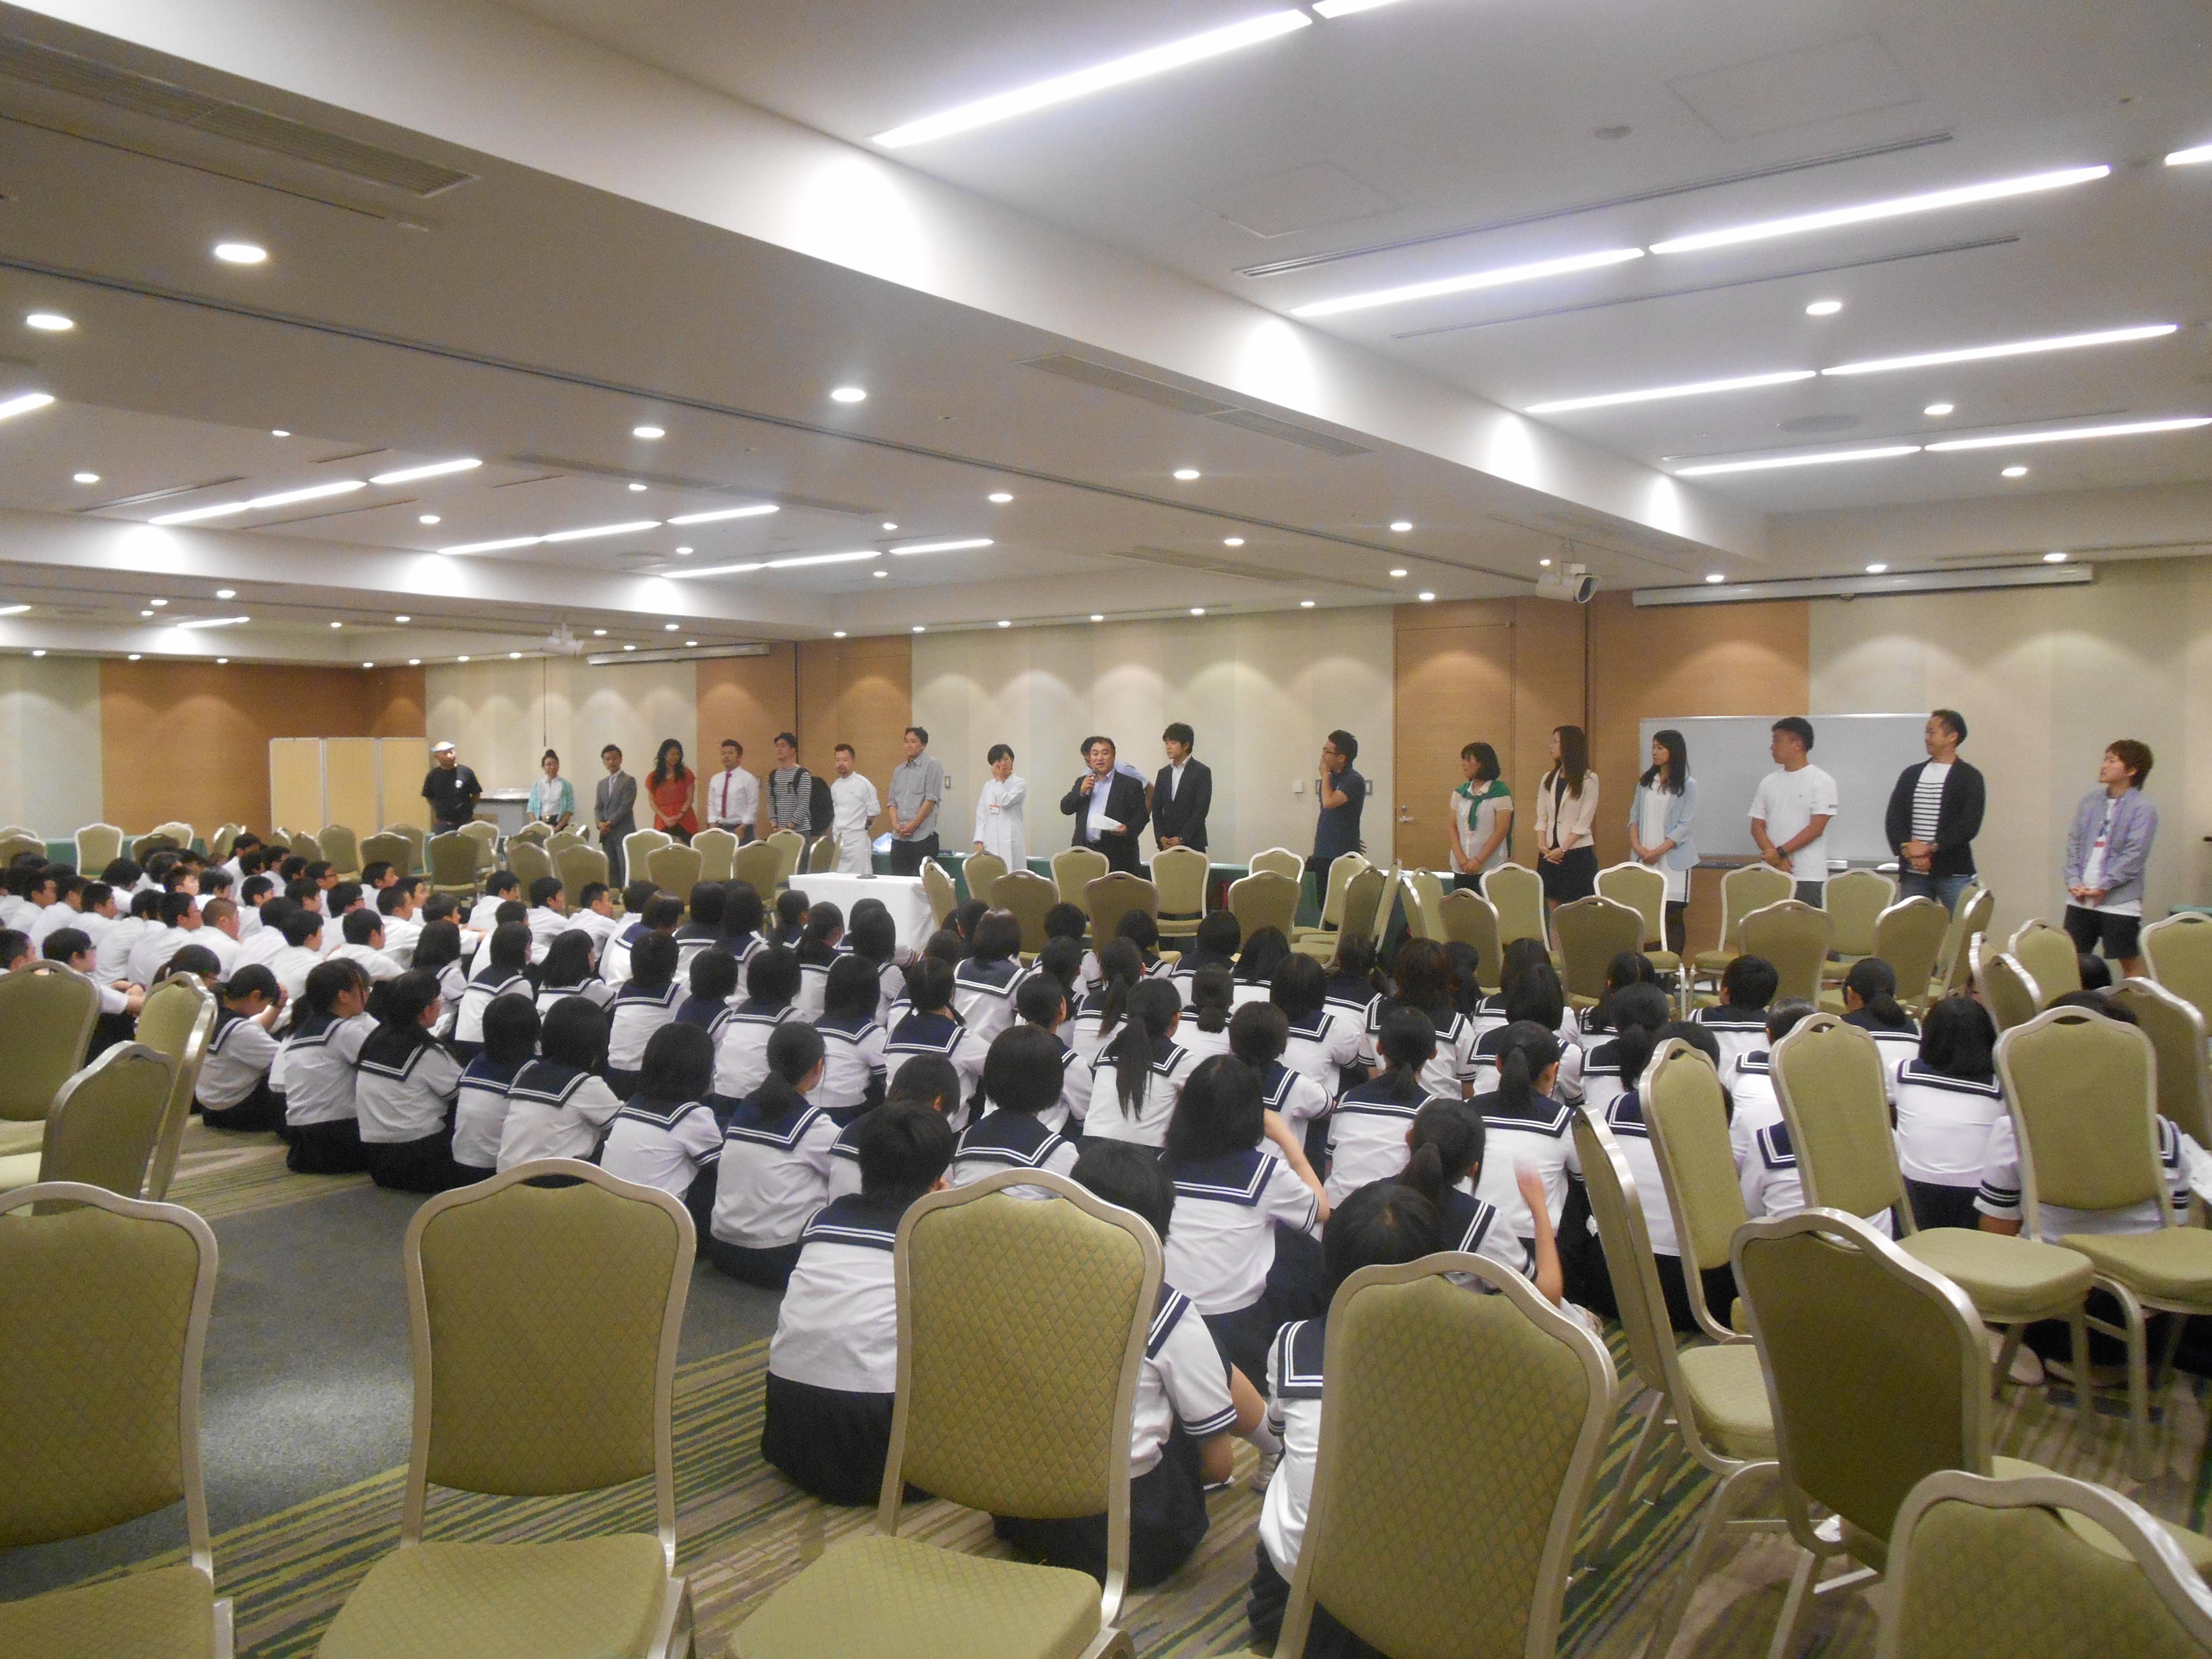 DSCN4372 - AOsuki主催:青森市内の中学校(修学旅行)に夢を与える時間